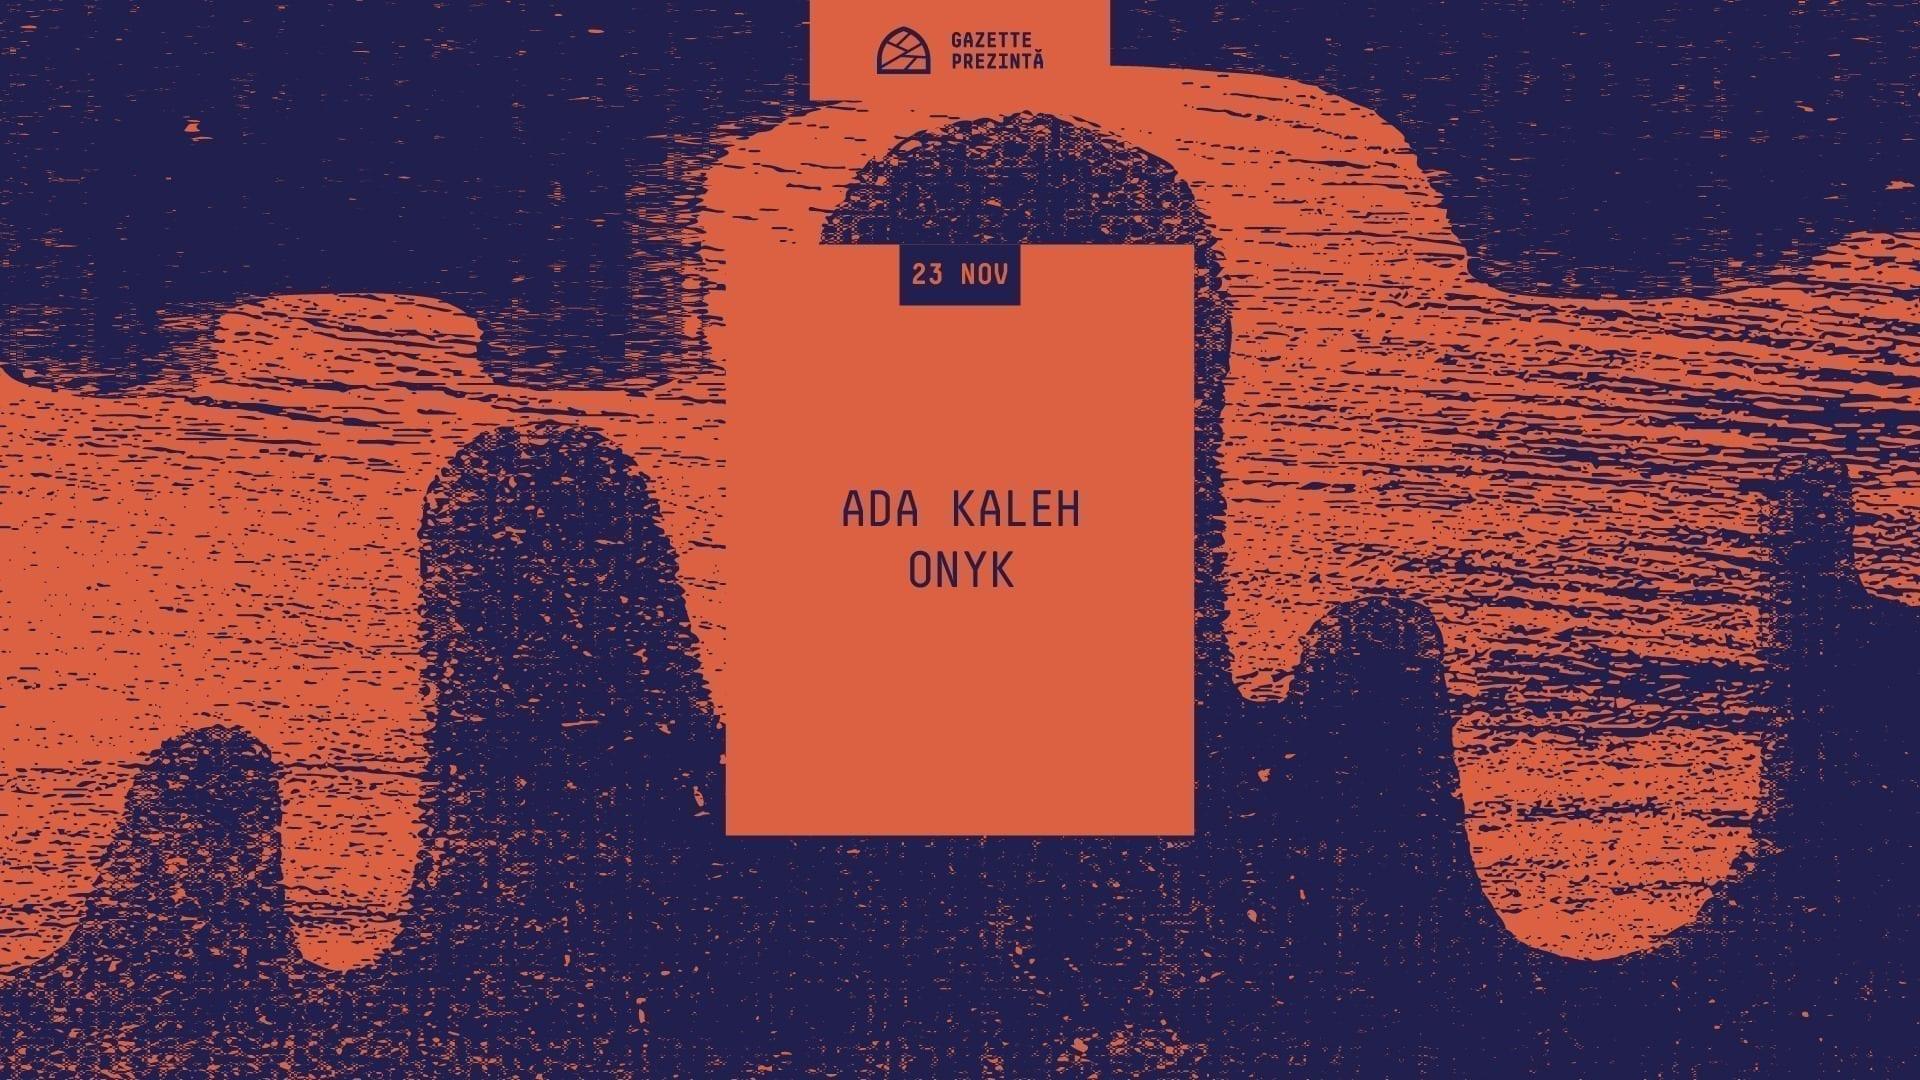 Gazette Prezintă: Ada Kaleh[R&S Records] : Onyk